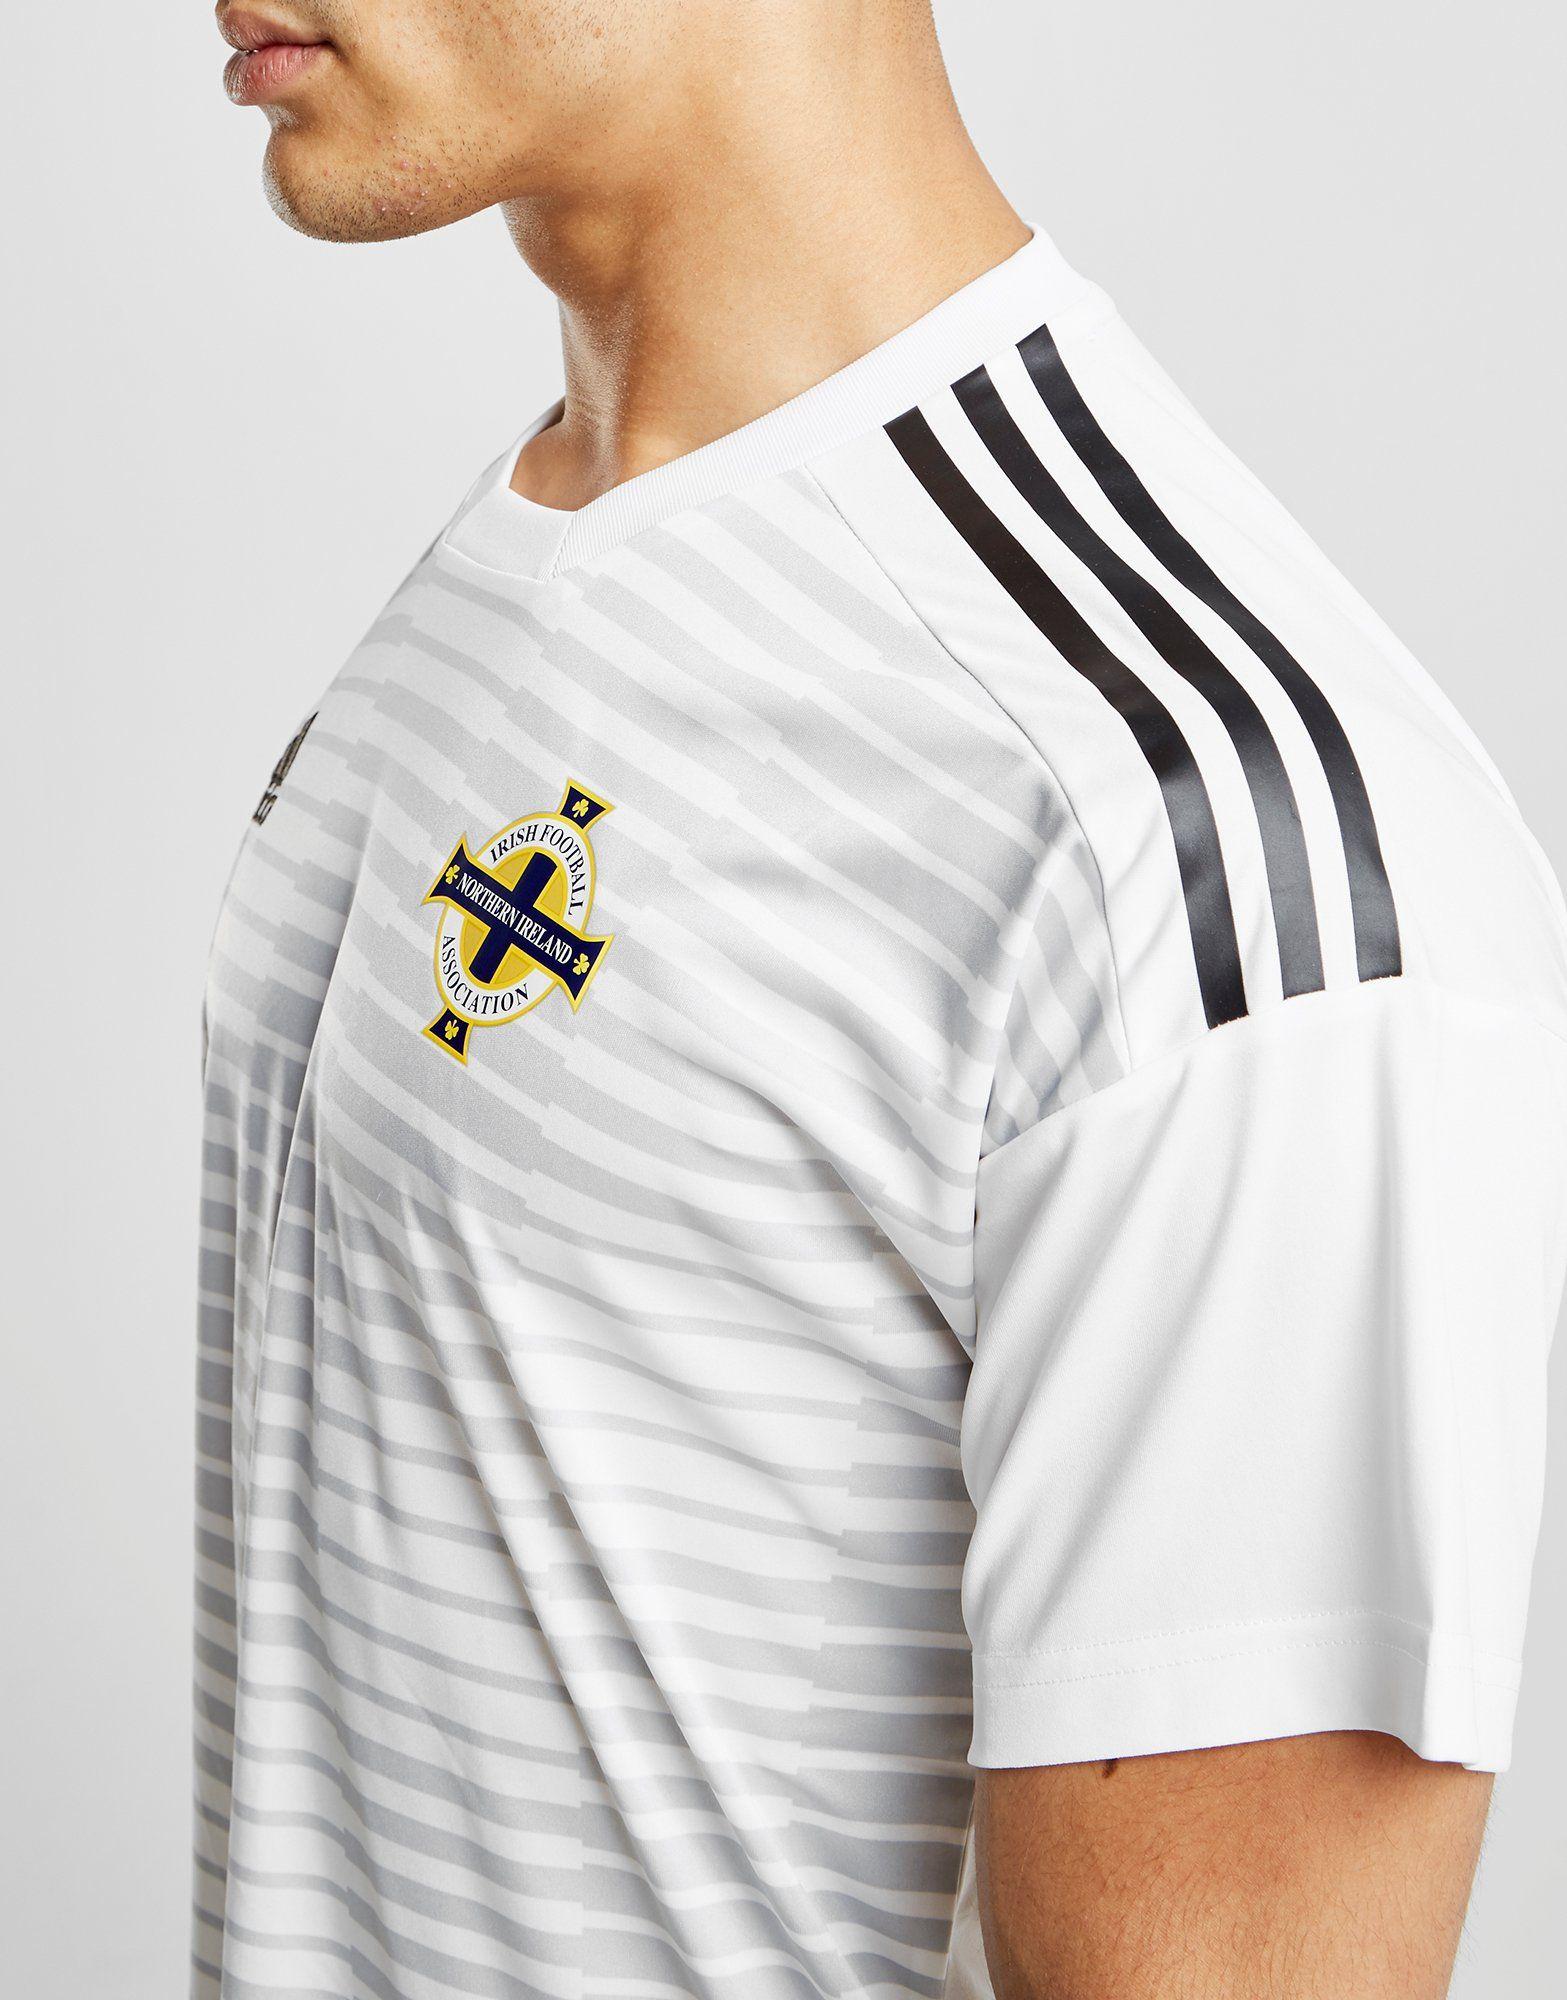 Ireland Pre Match adidas 2018 Shirt 19 Northern Weiss adidas Northern Y04wHtx